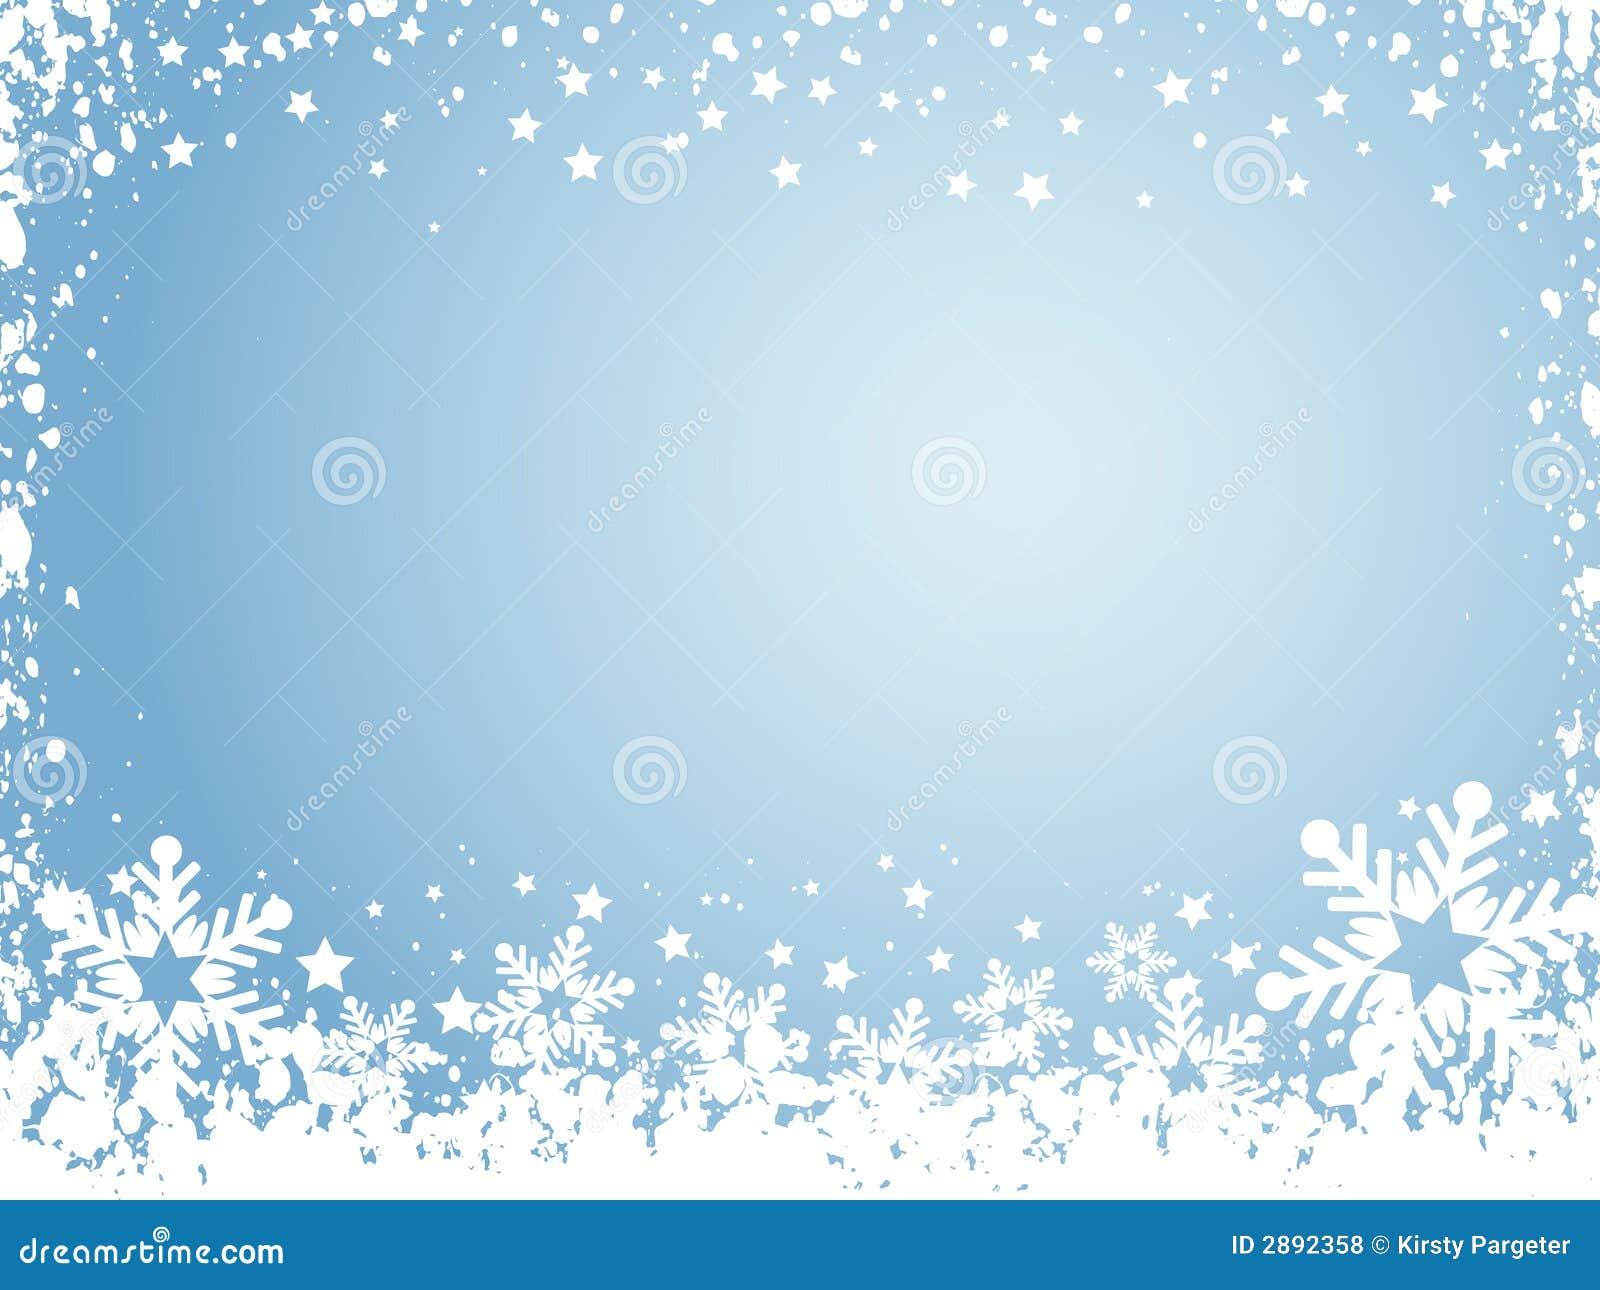 Snowflake Background Royalty Free Stock Photos - Image: 2892358